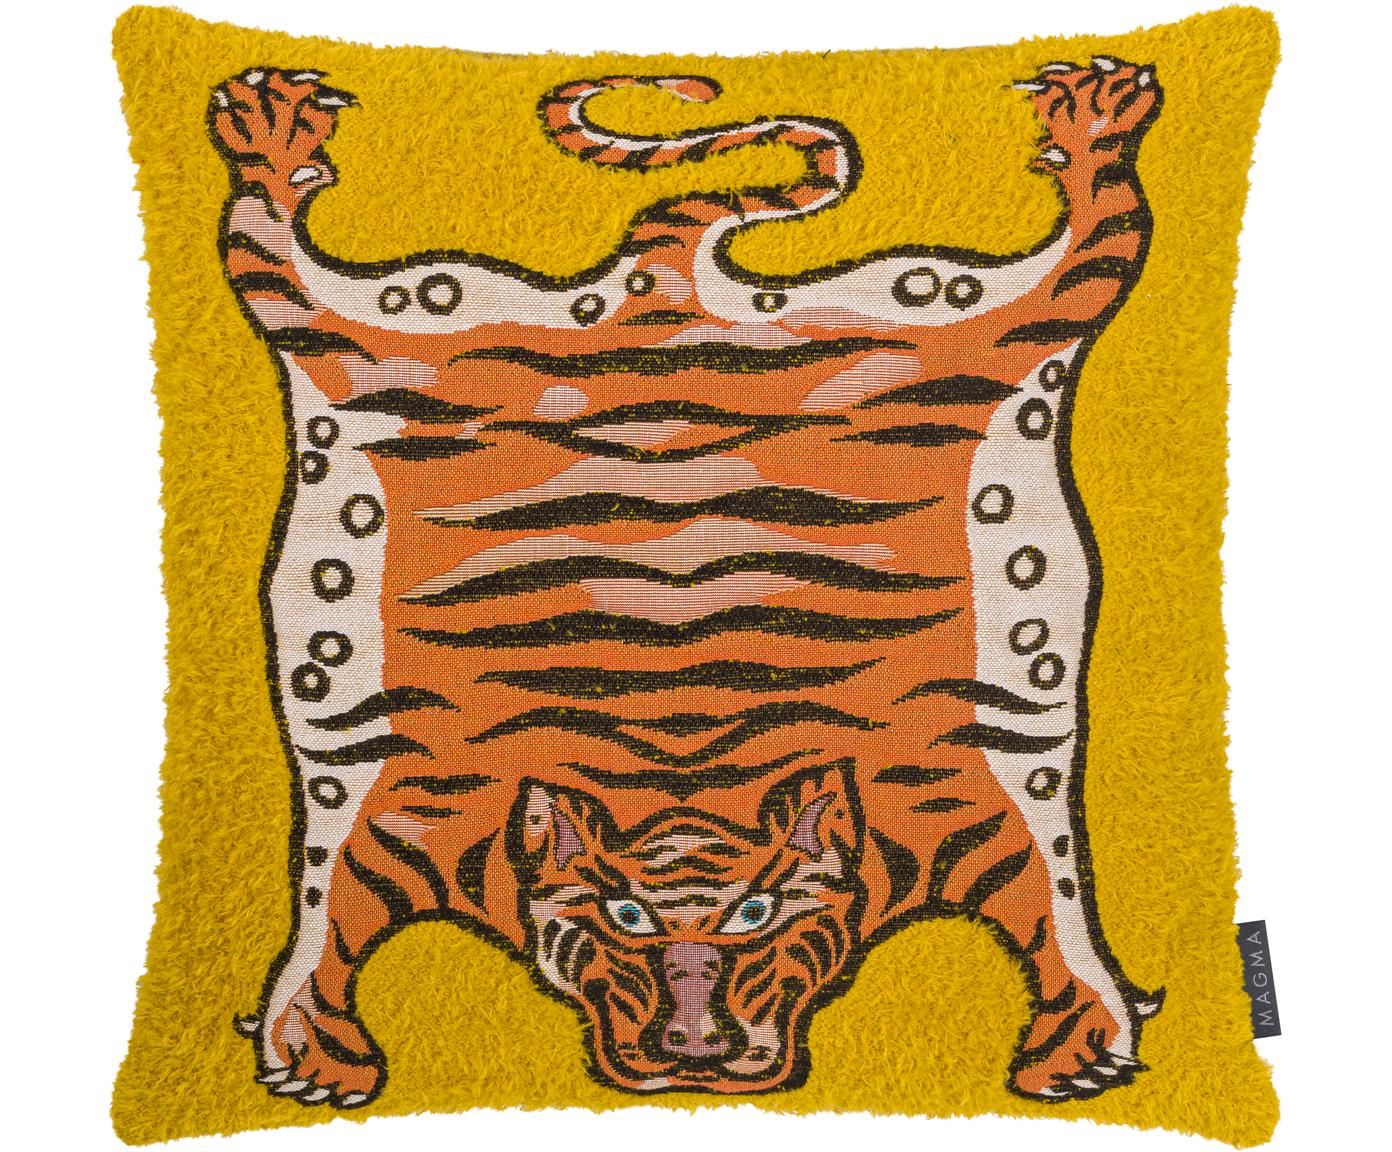 Federa arredo Tigris, Tessuto: jacquard, Giallo, arancione, nero, Larg. 45 x Lung. 45 cm